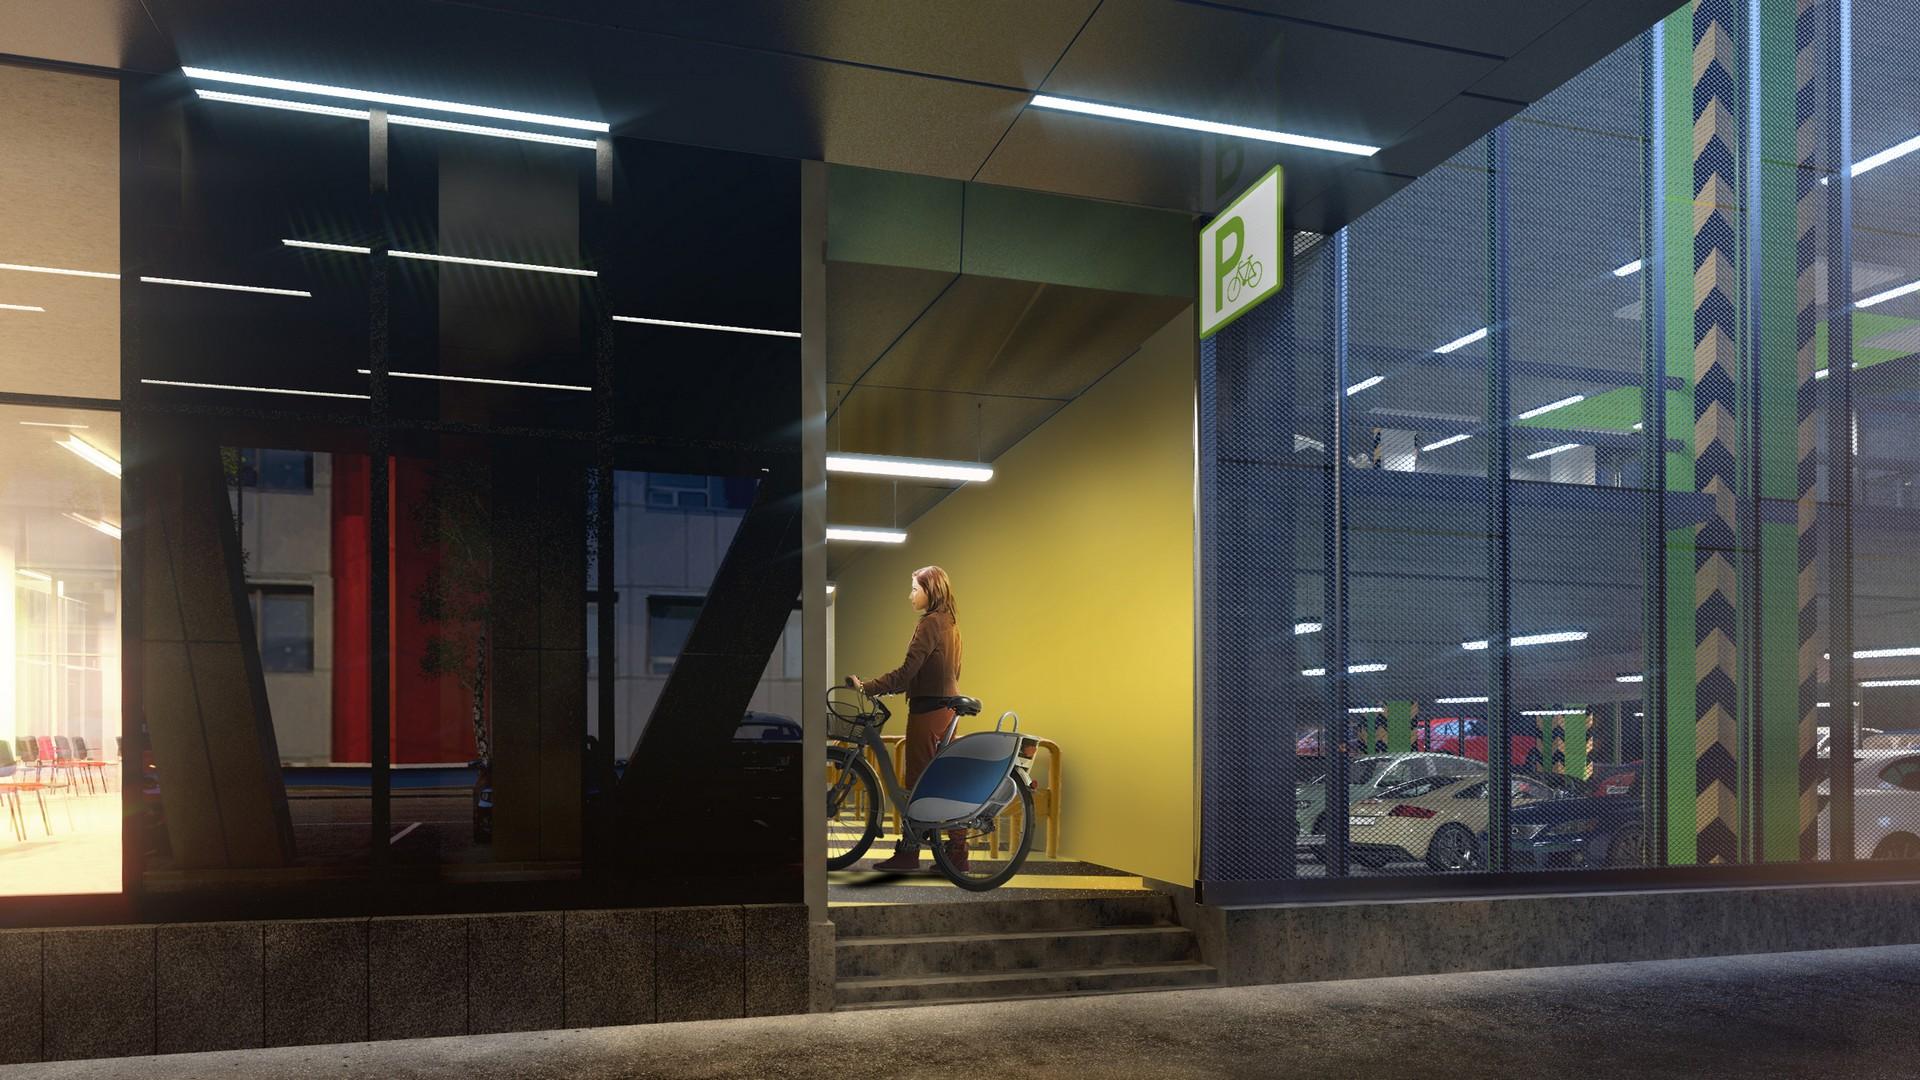 027 Bicycle parking